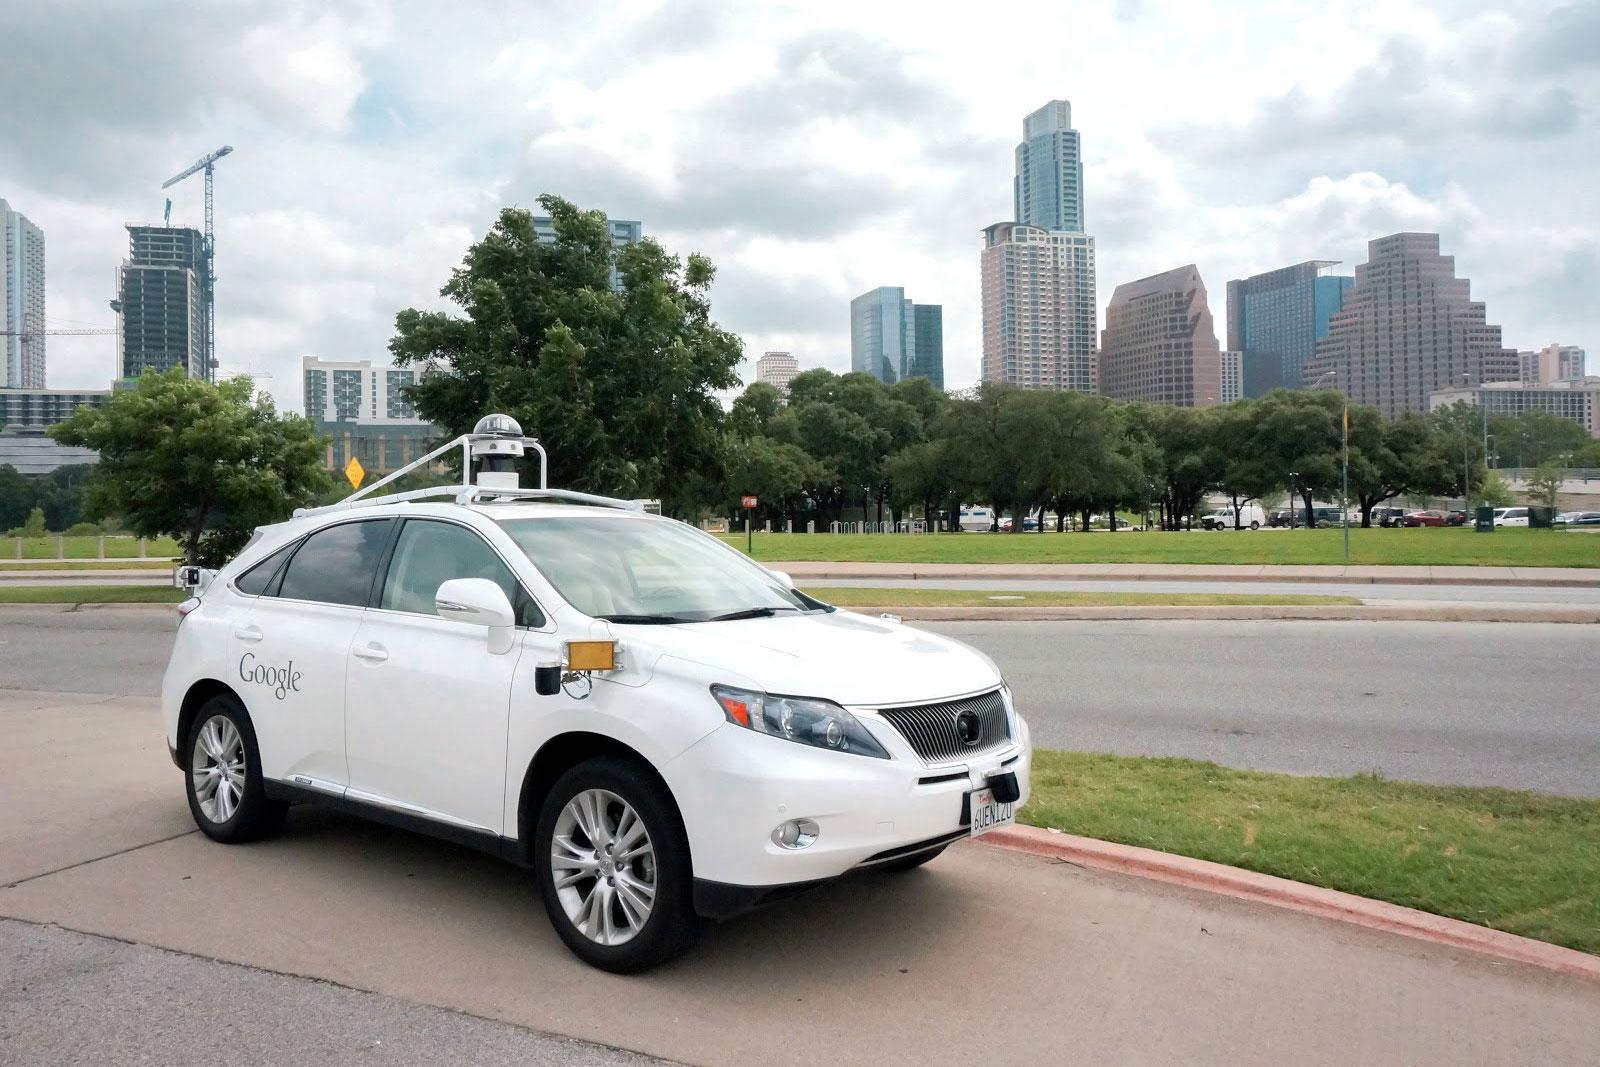 google-self-driving-lexus-austin.jpg